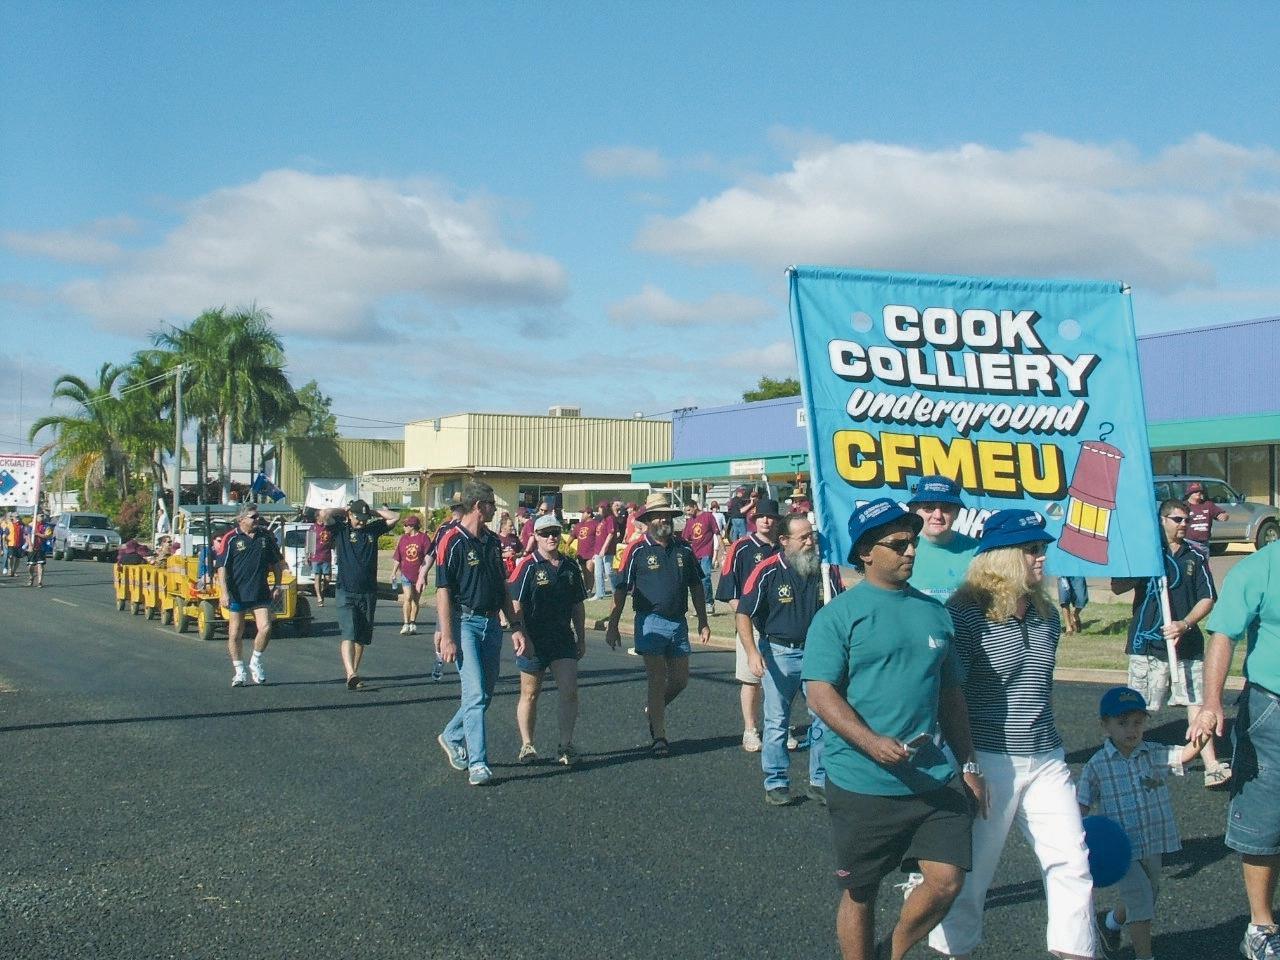 Cook Colliery CFMEU